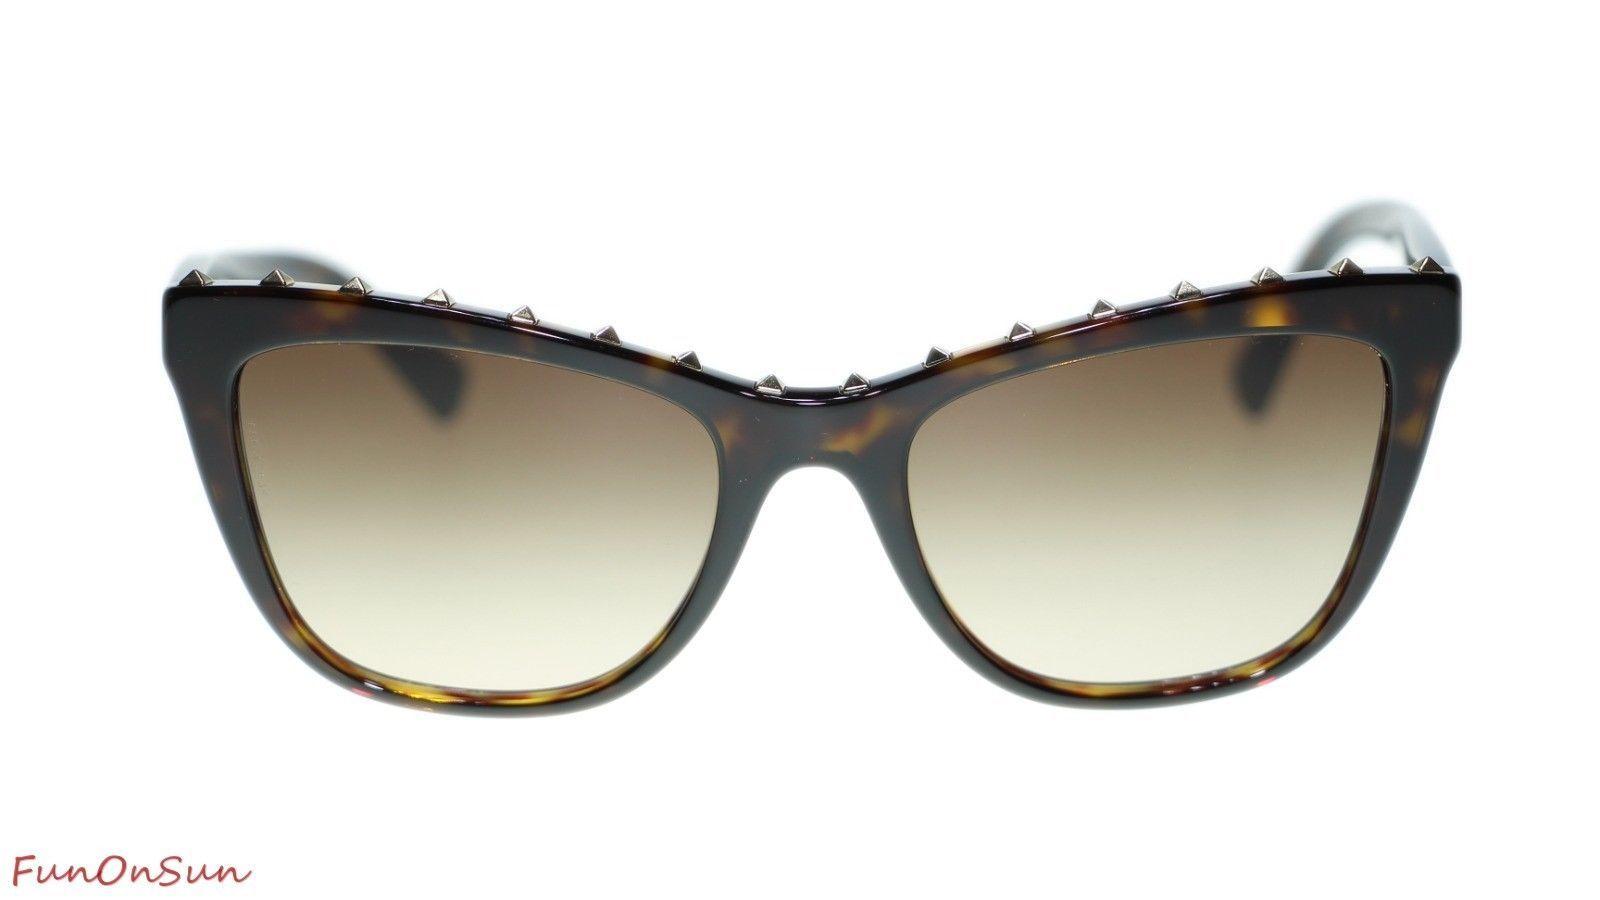 Valentino Sunglasses VA4022 500213 Havana/Brown Lens Italian Authentic 54mm